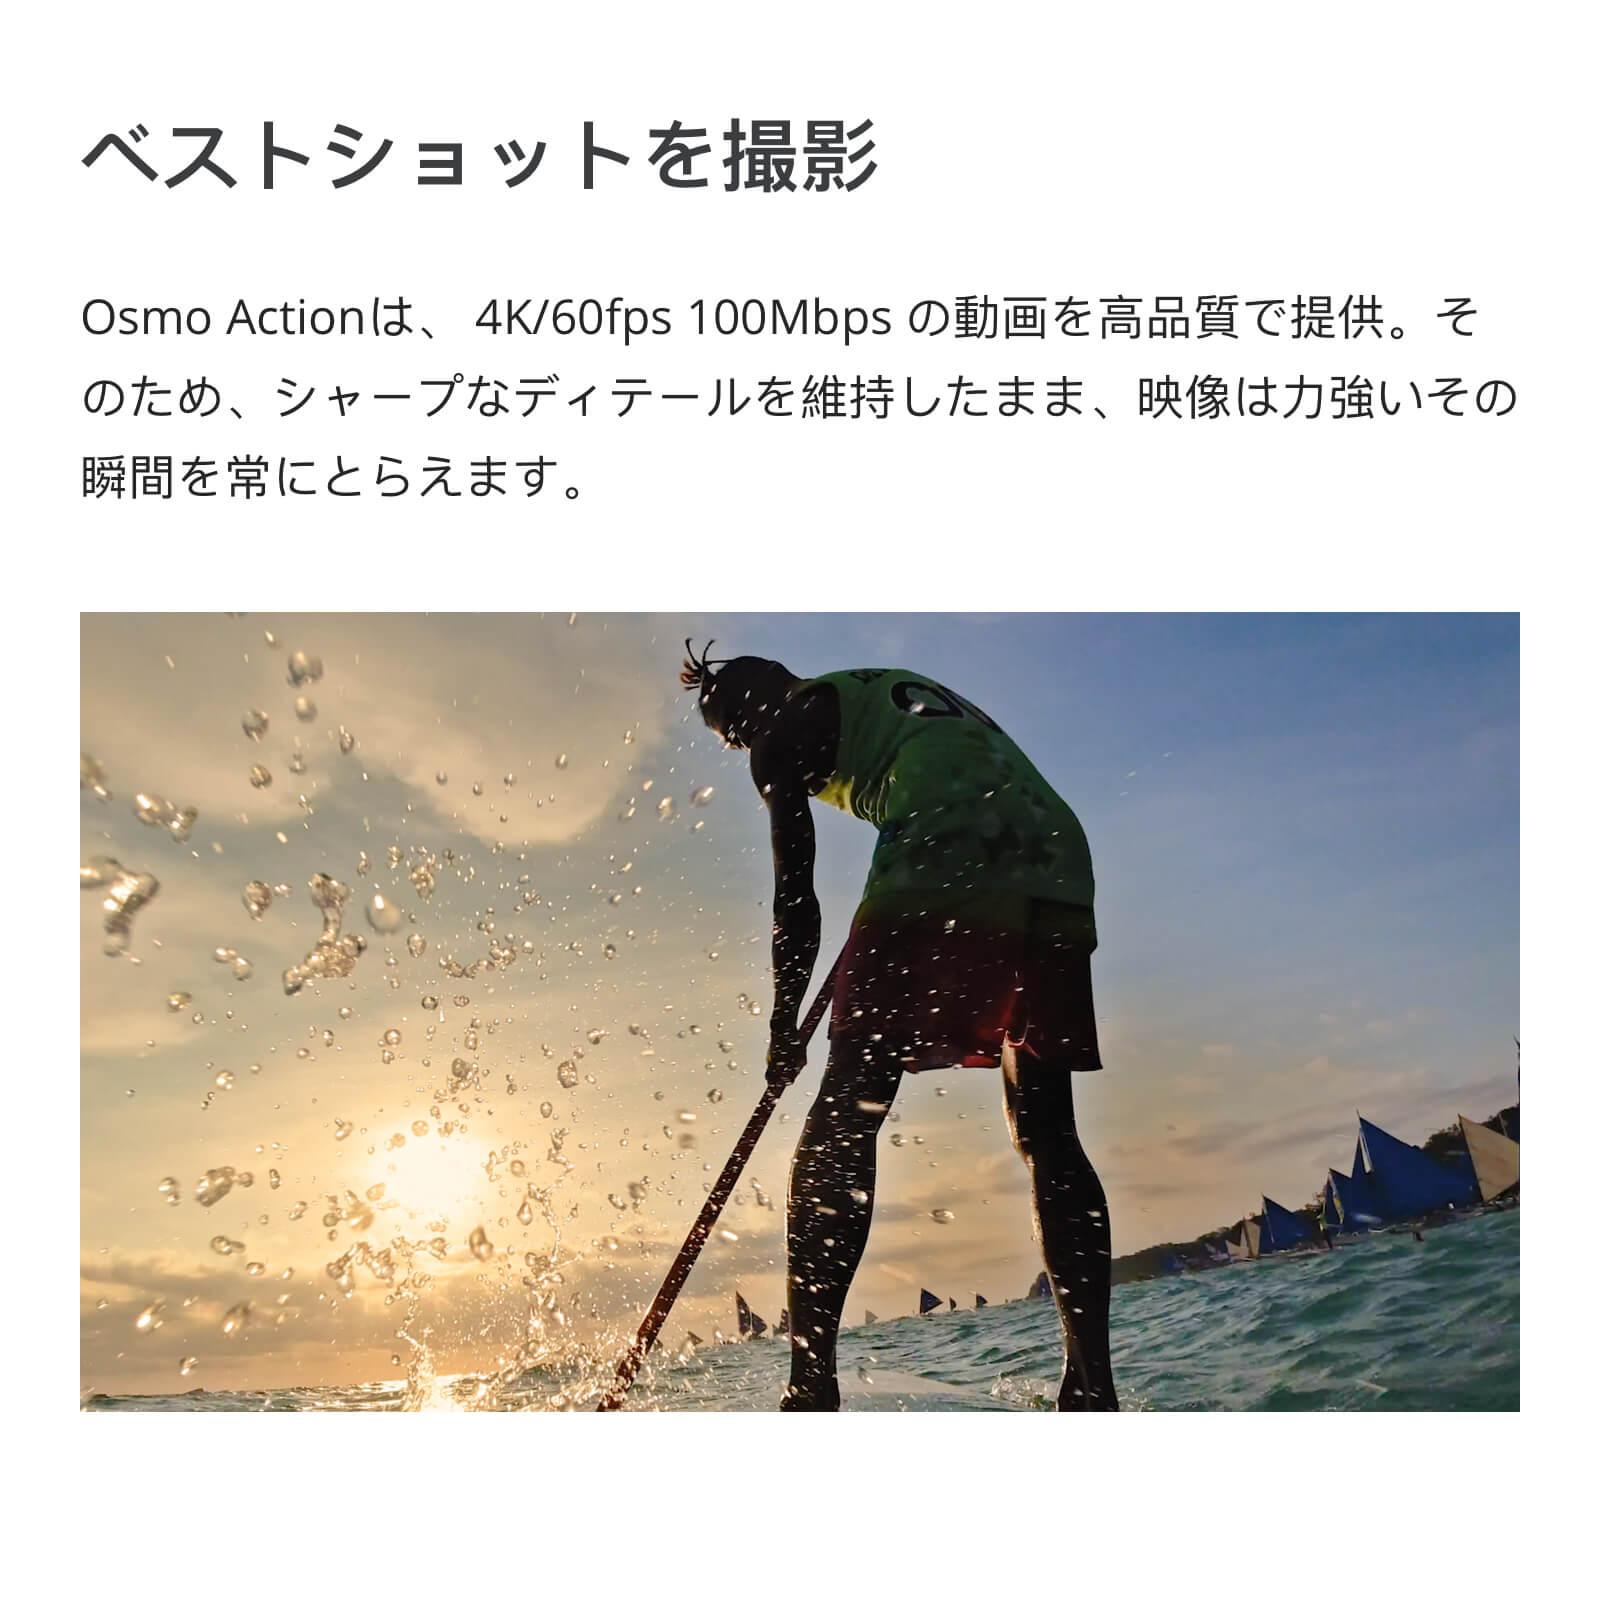 https://www.drone-station.net/images/DJI/osmoaction/06action.jpg